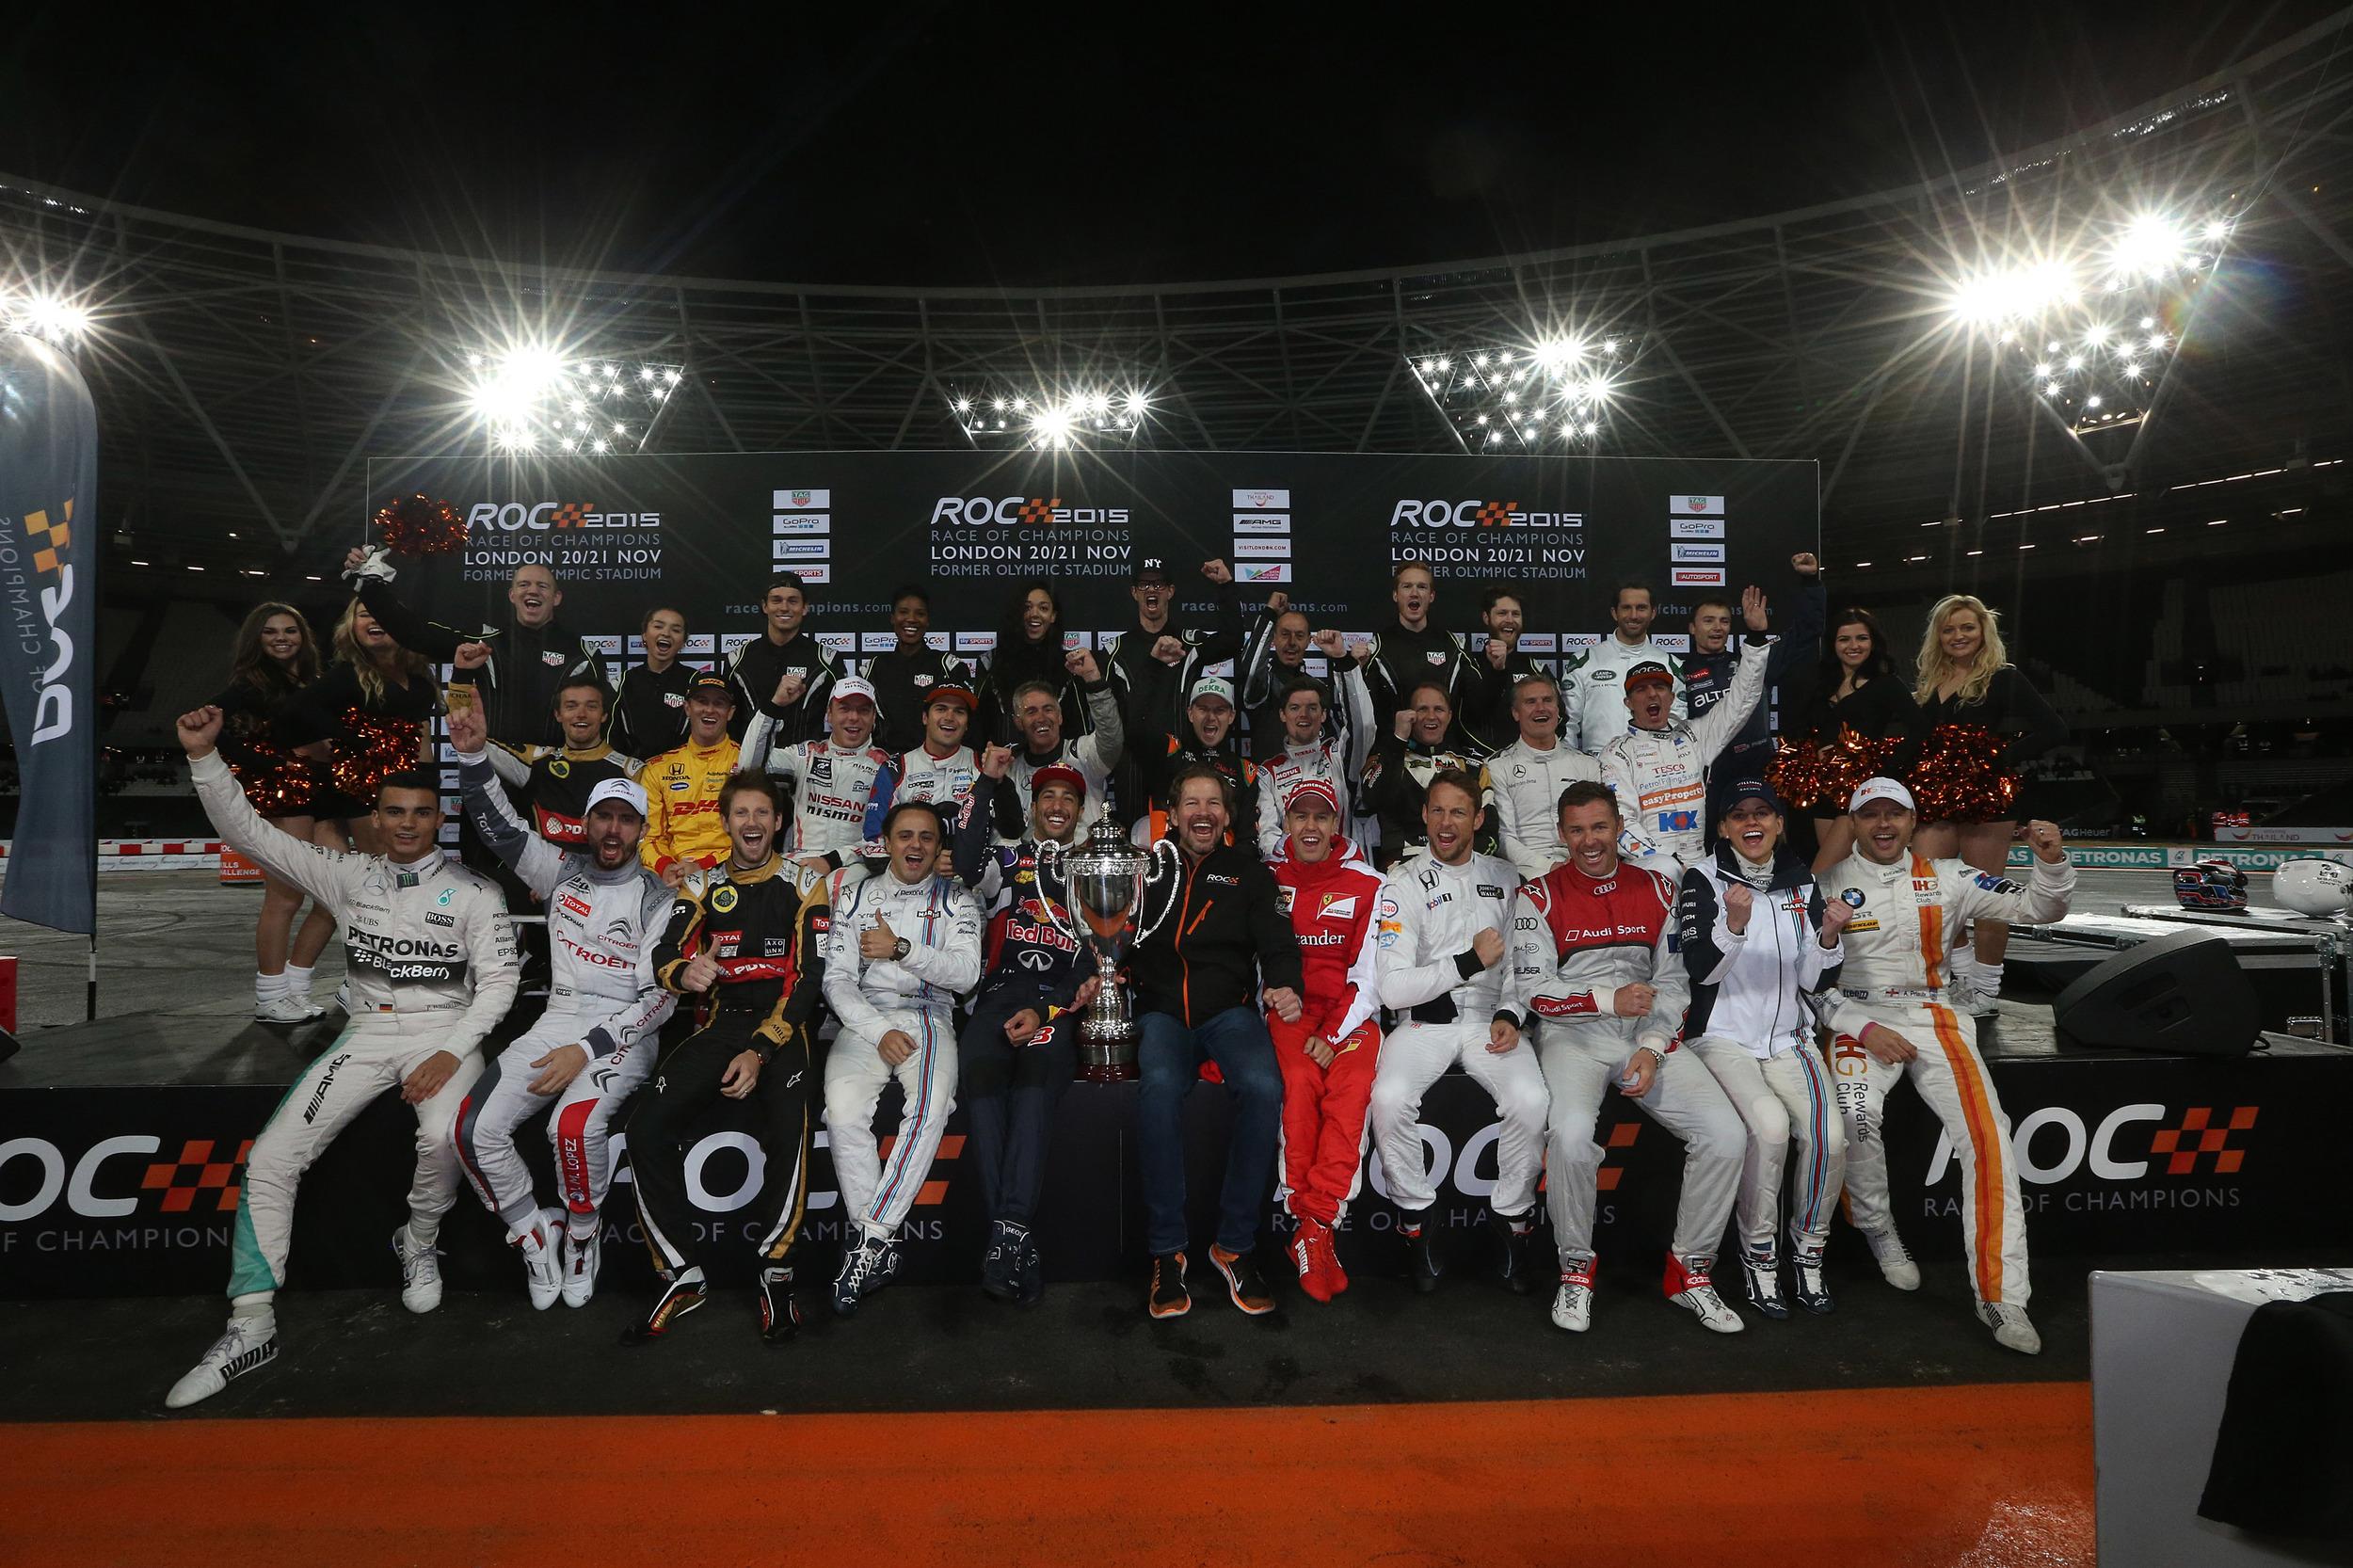 Sebastian Vettel 2015 Champion Of Champions 14